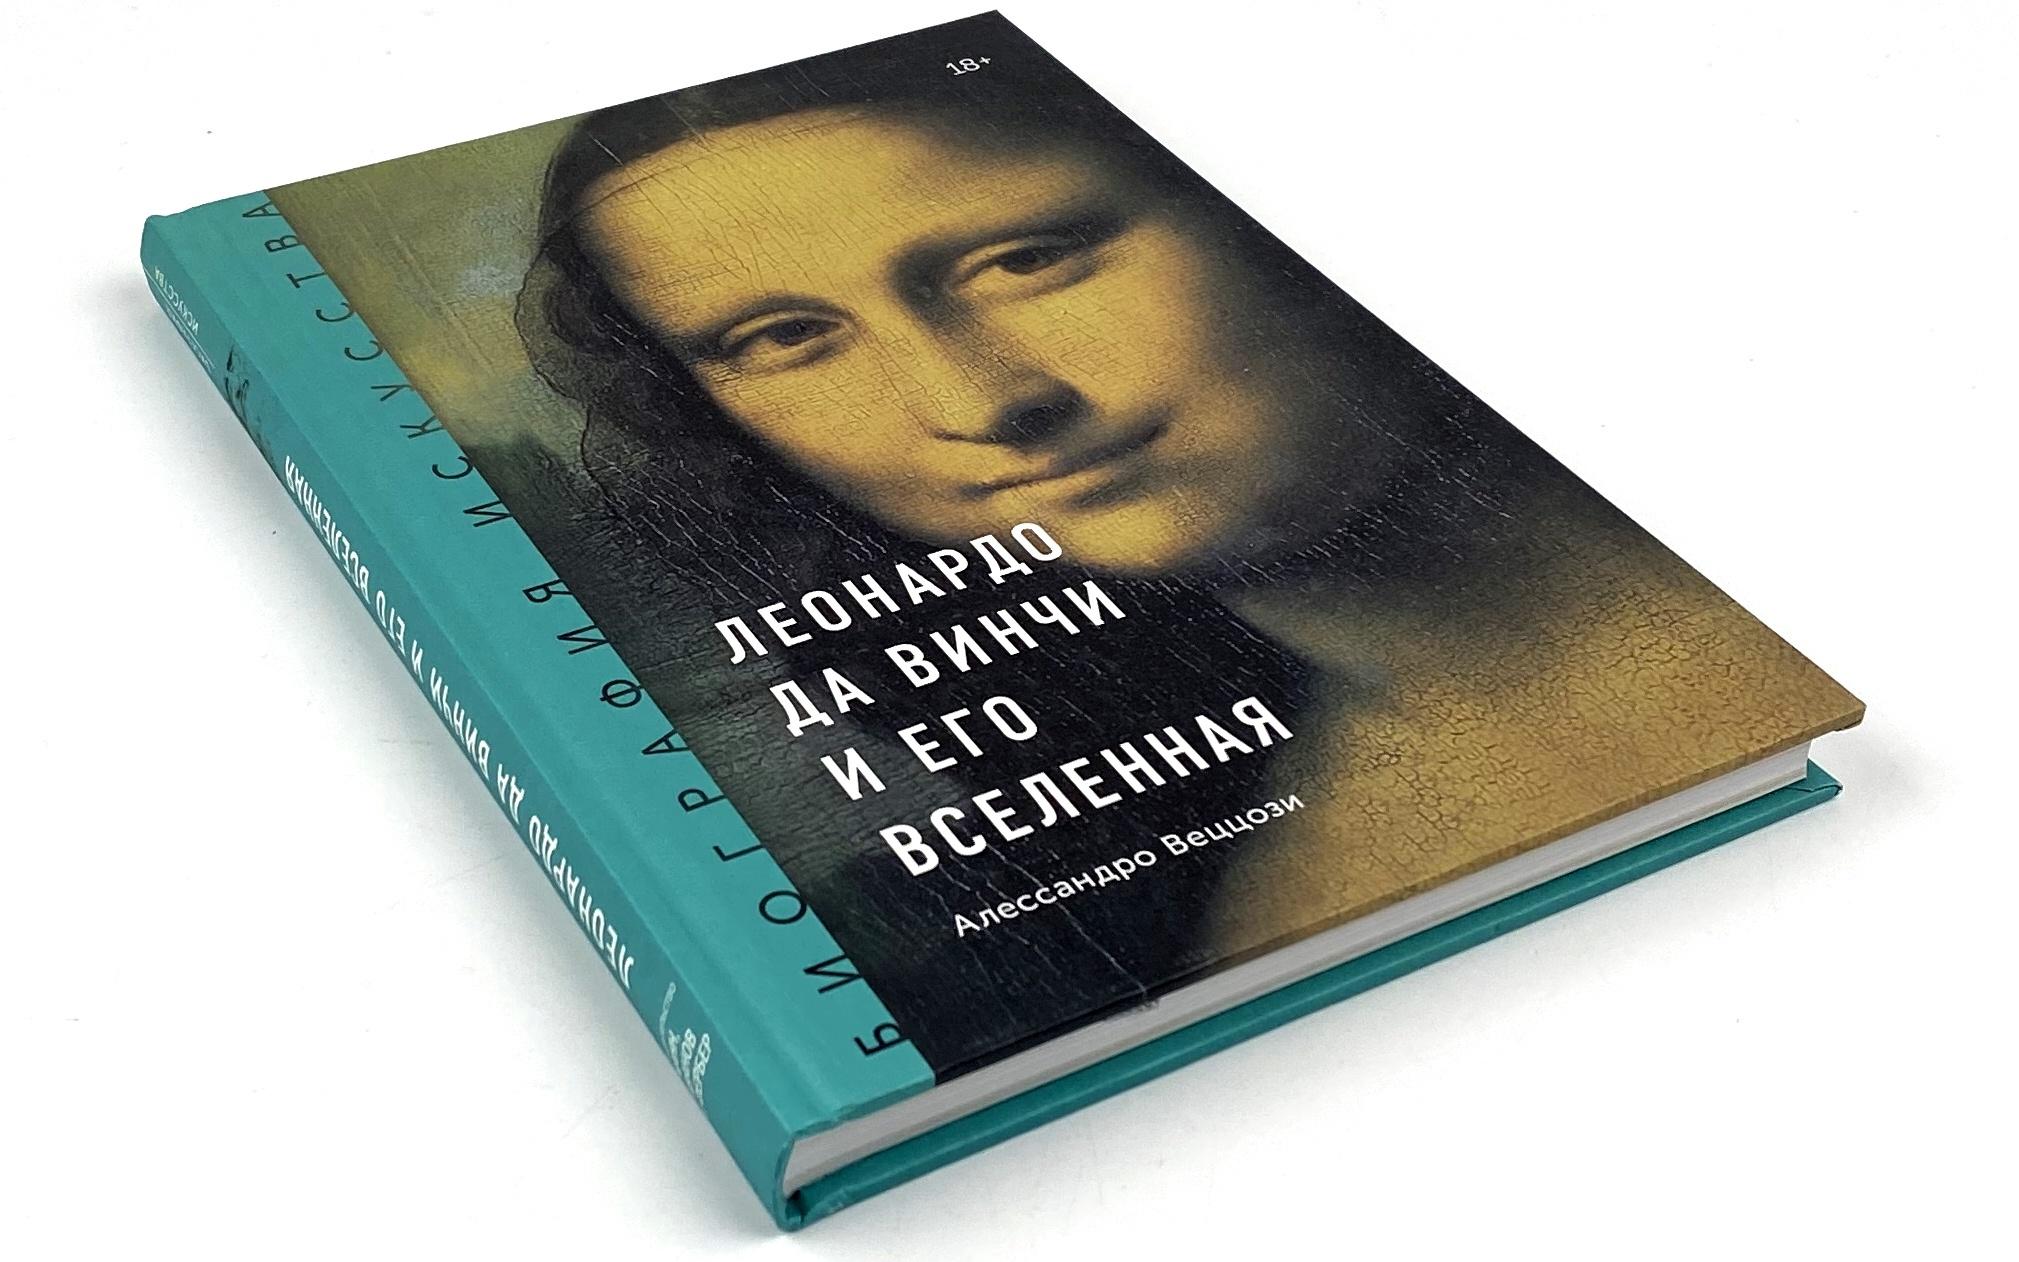 Леонардо да Винчи и его Вселенная. Автор — Алессандро Веццози.